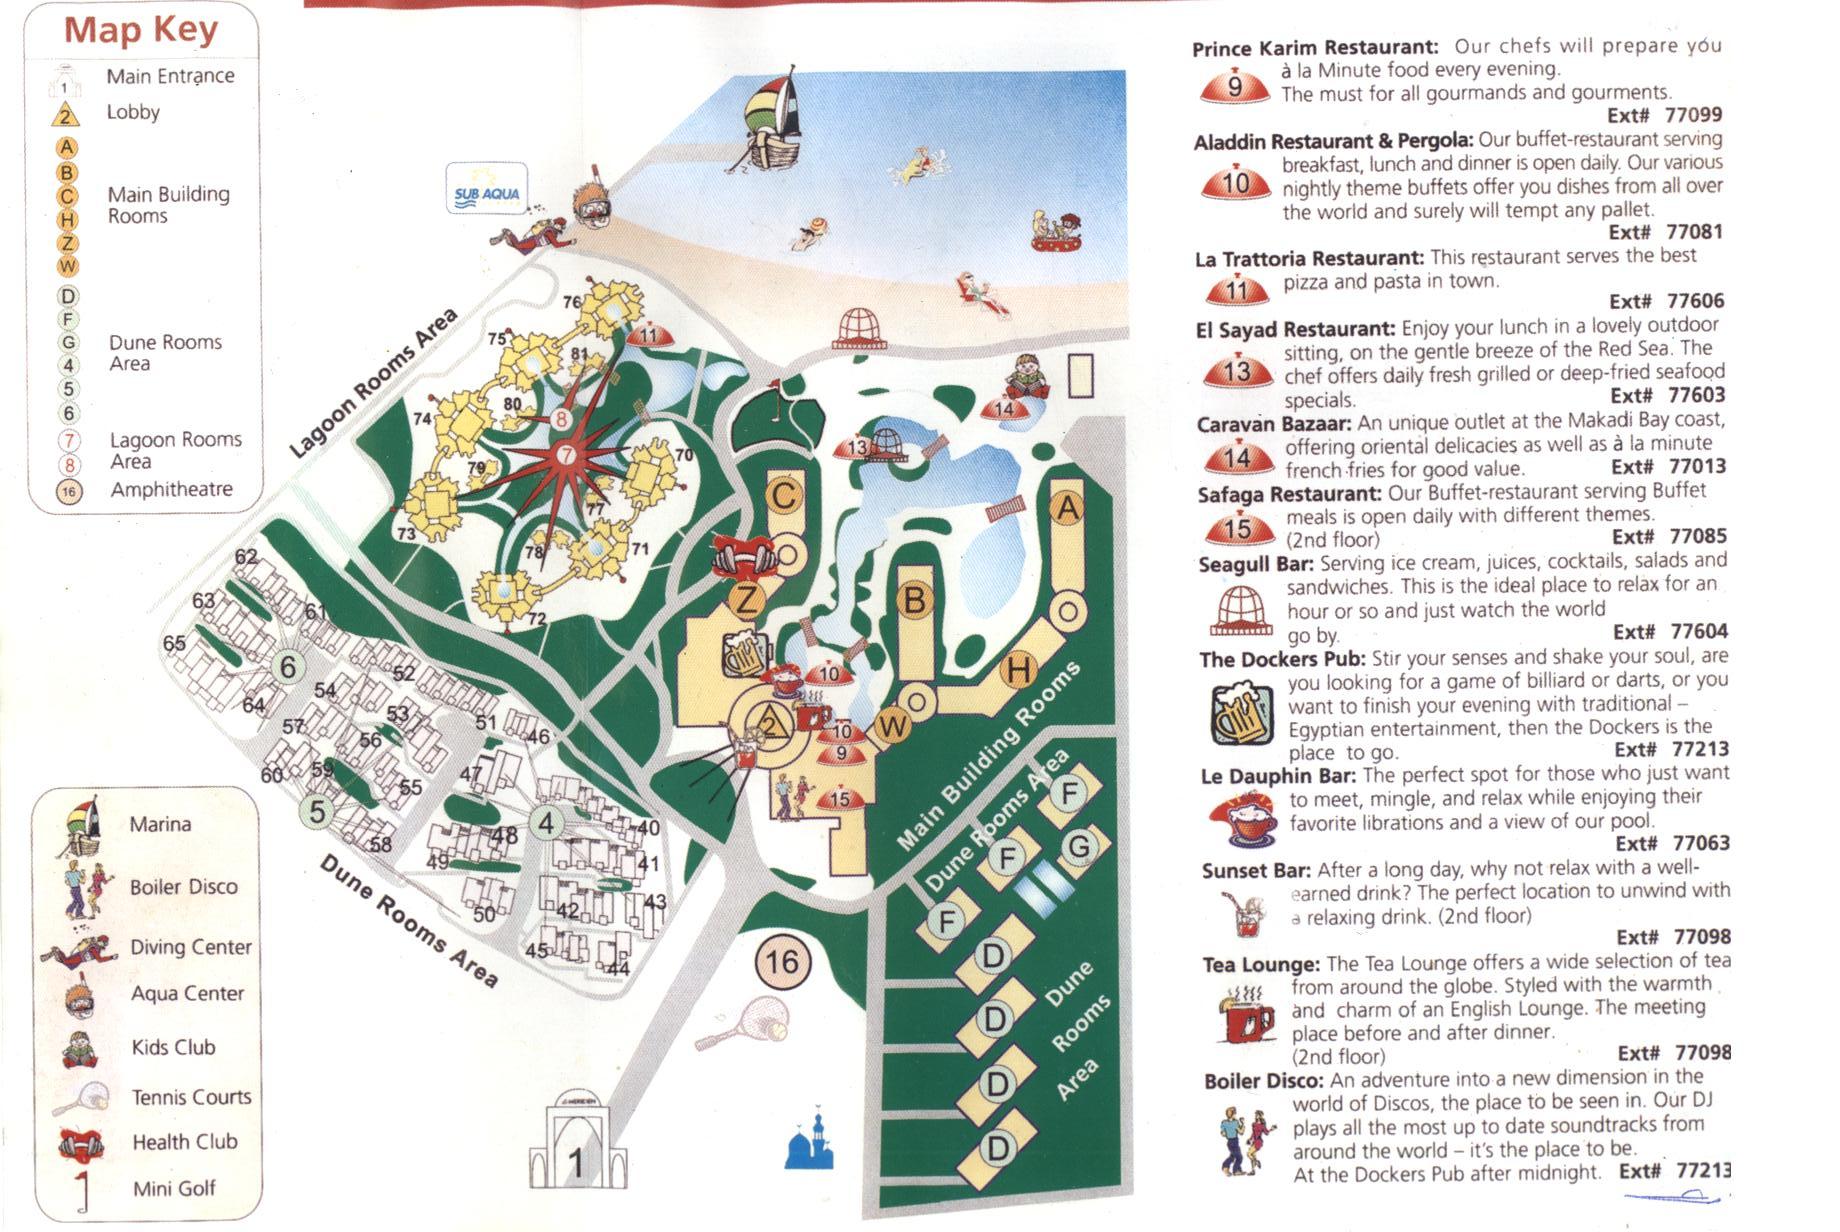 Карта Отеля Тиа Хайтс - filmsfinger: http://filmsfinger.weebly.com/blog/karta-otelya-tia-hayts